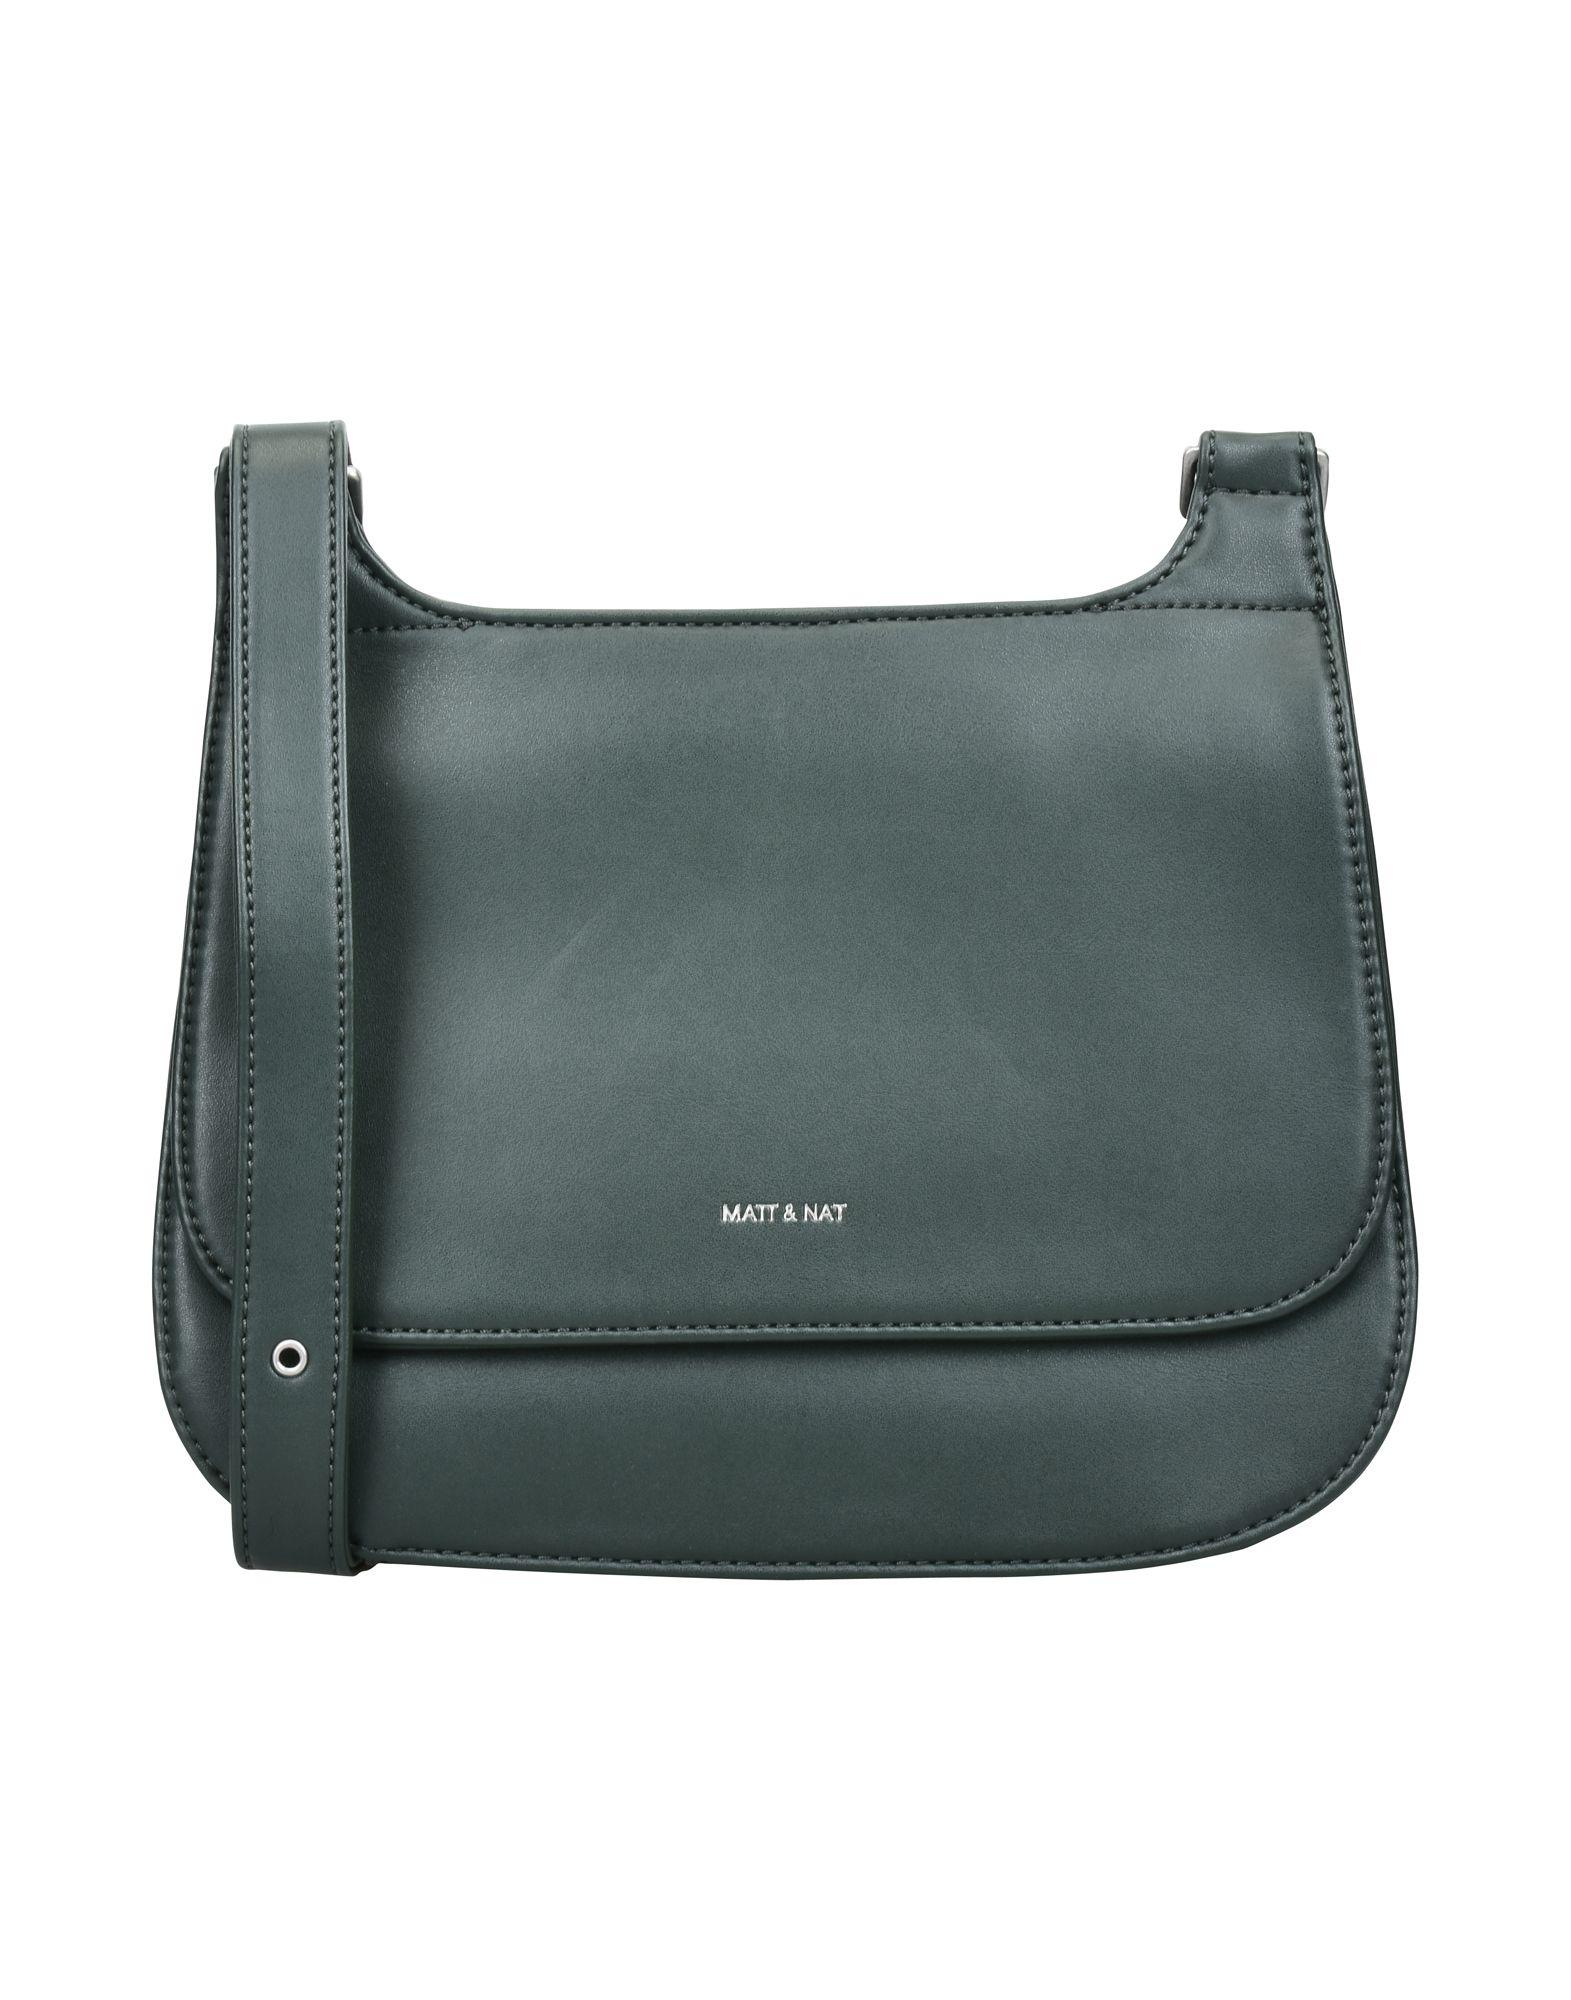 master&muse x matt & nat сумка на плечо MATT & NAT Сумка через плечо